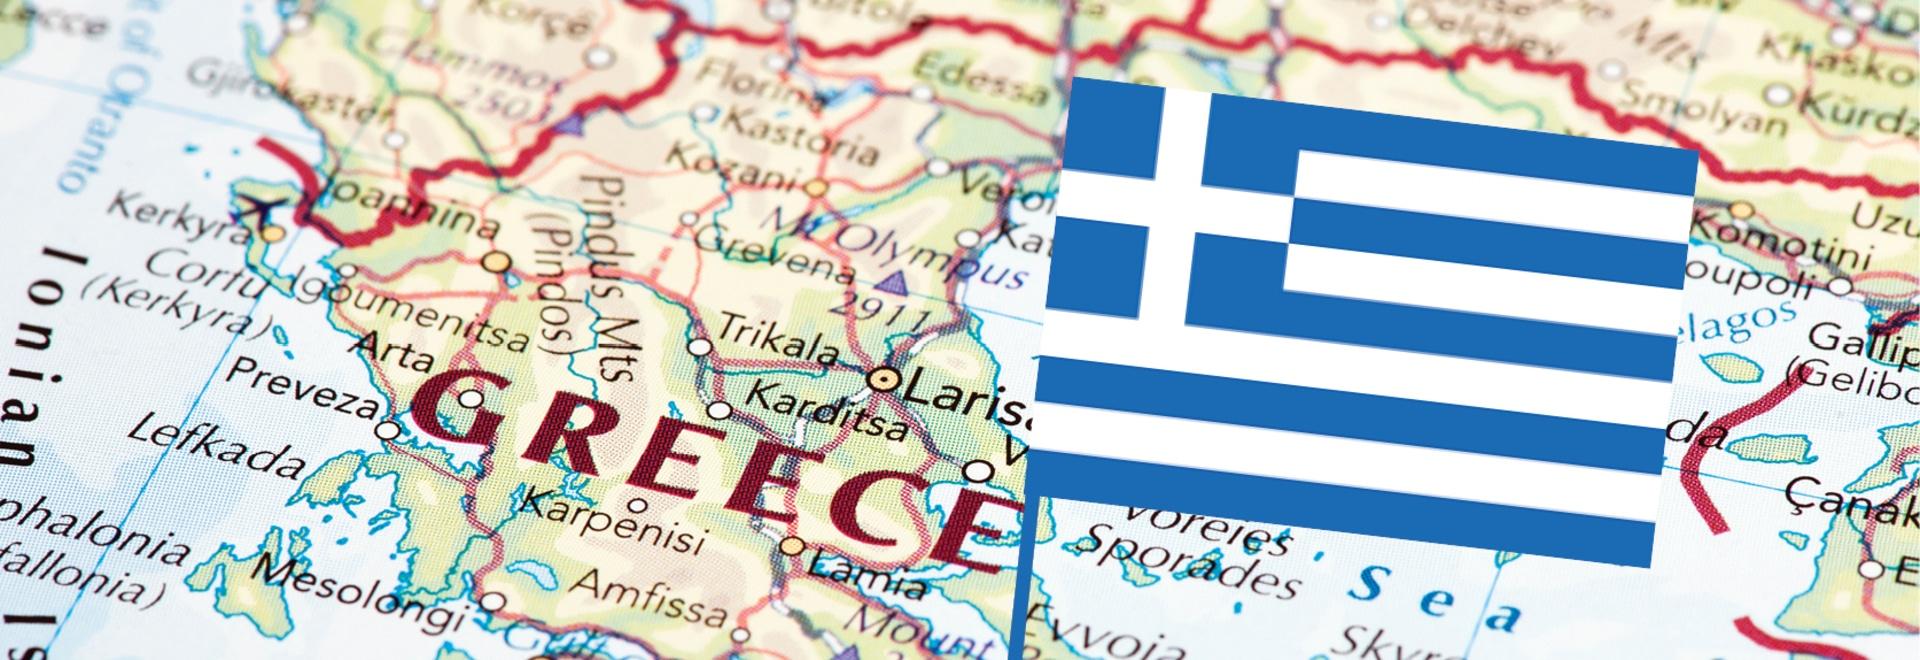 DESMI Strengthens Presence in Greece